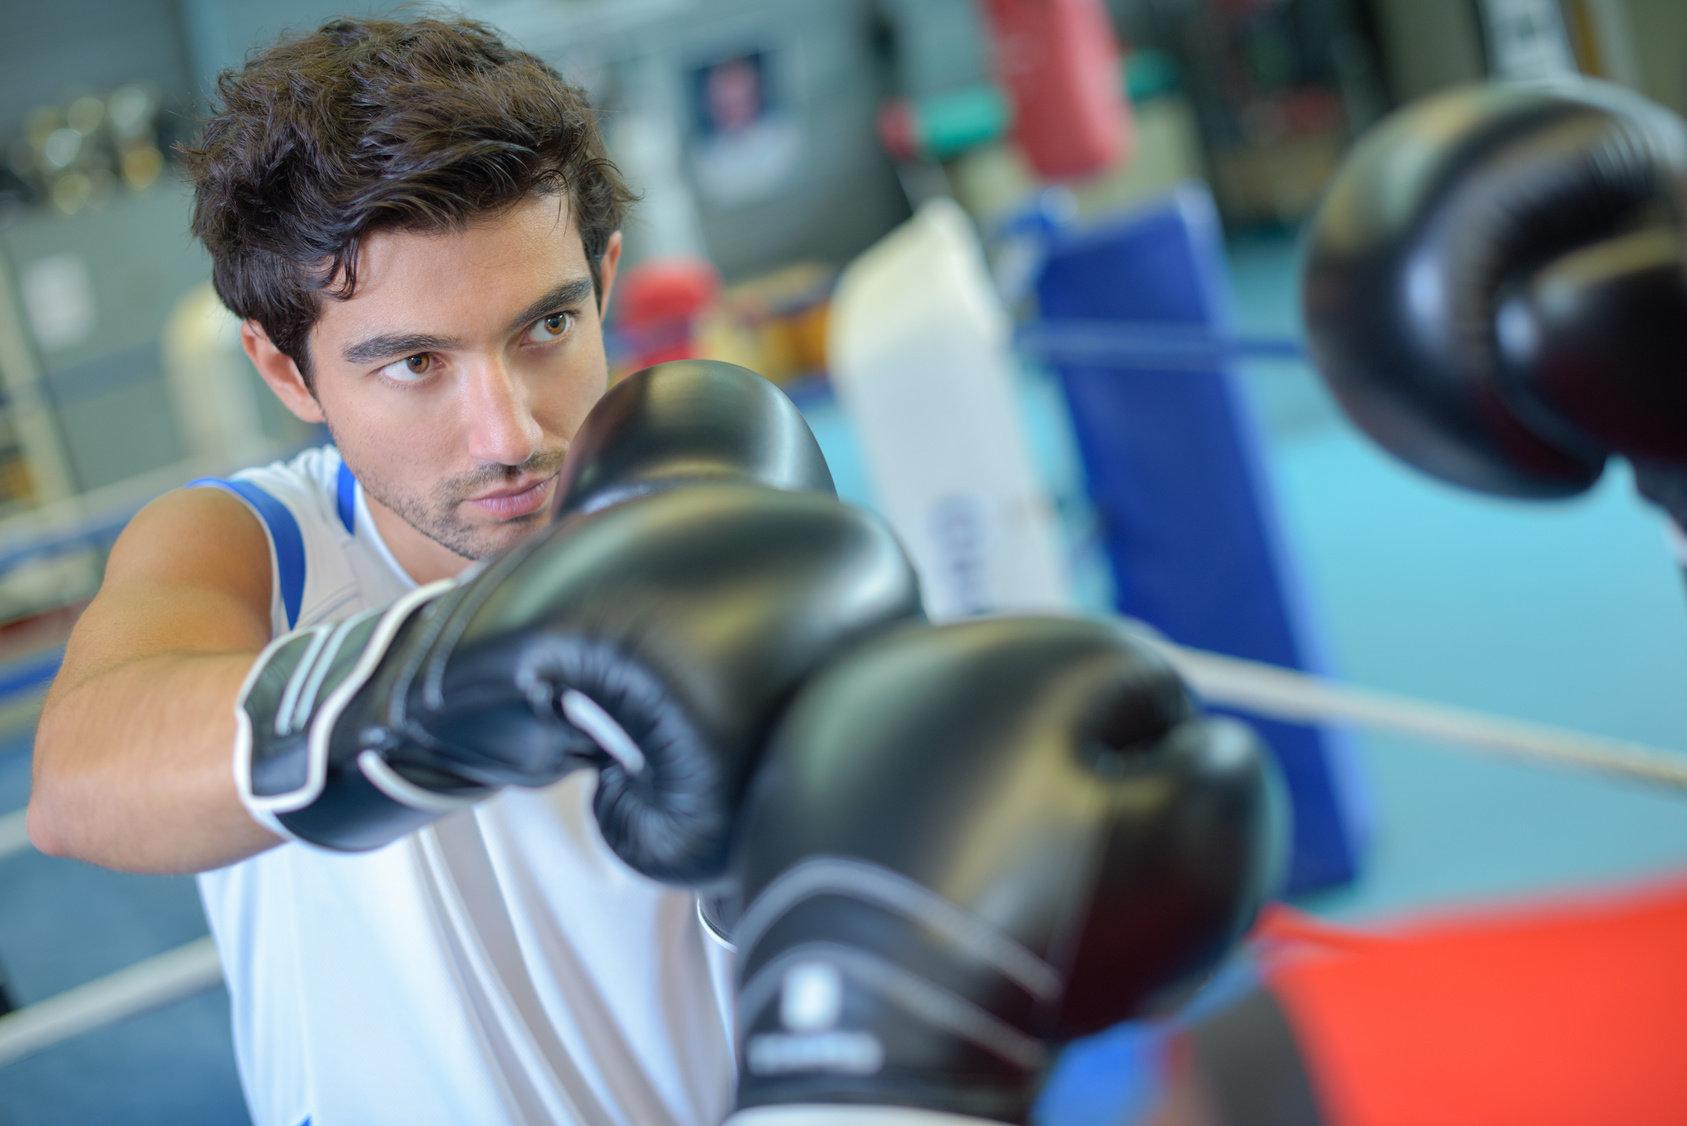 Boxing Cardio